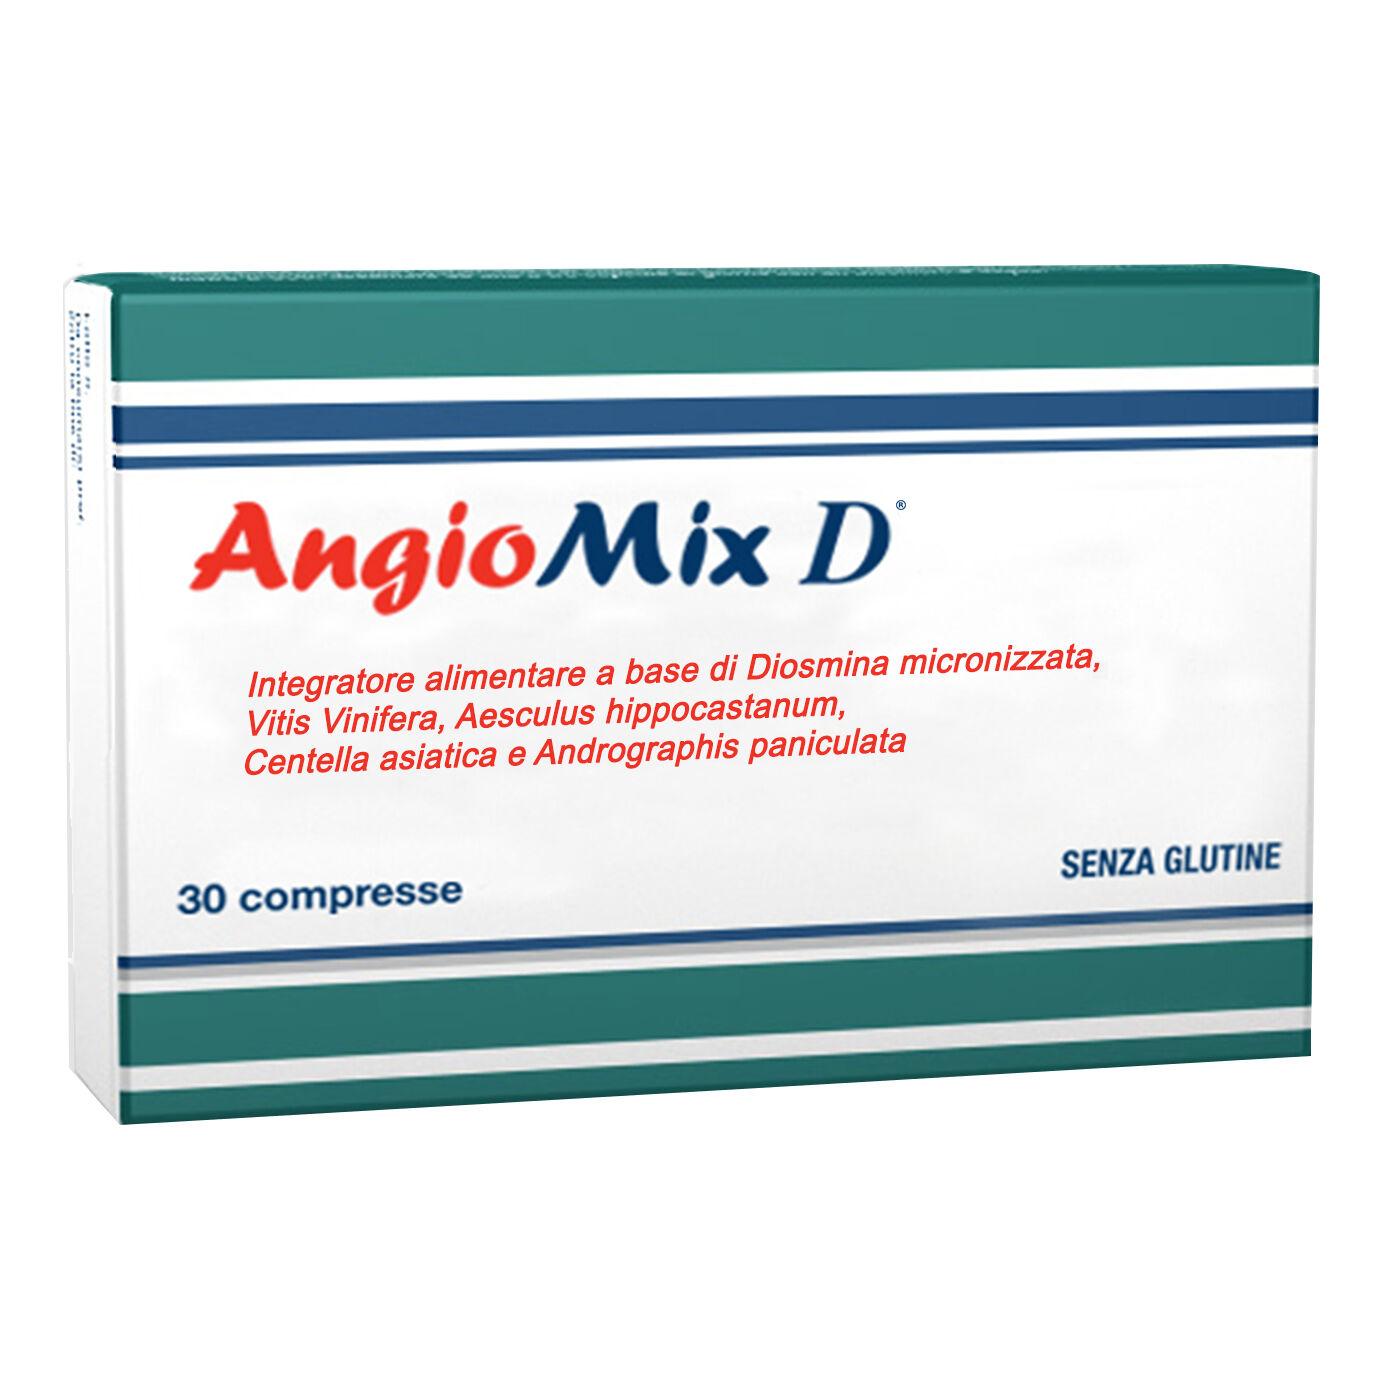 piam farmaceutici spa angiomix d 30 compresse